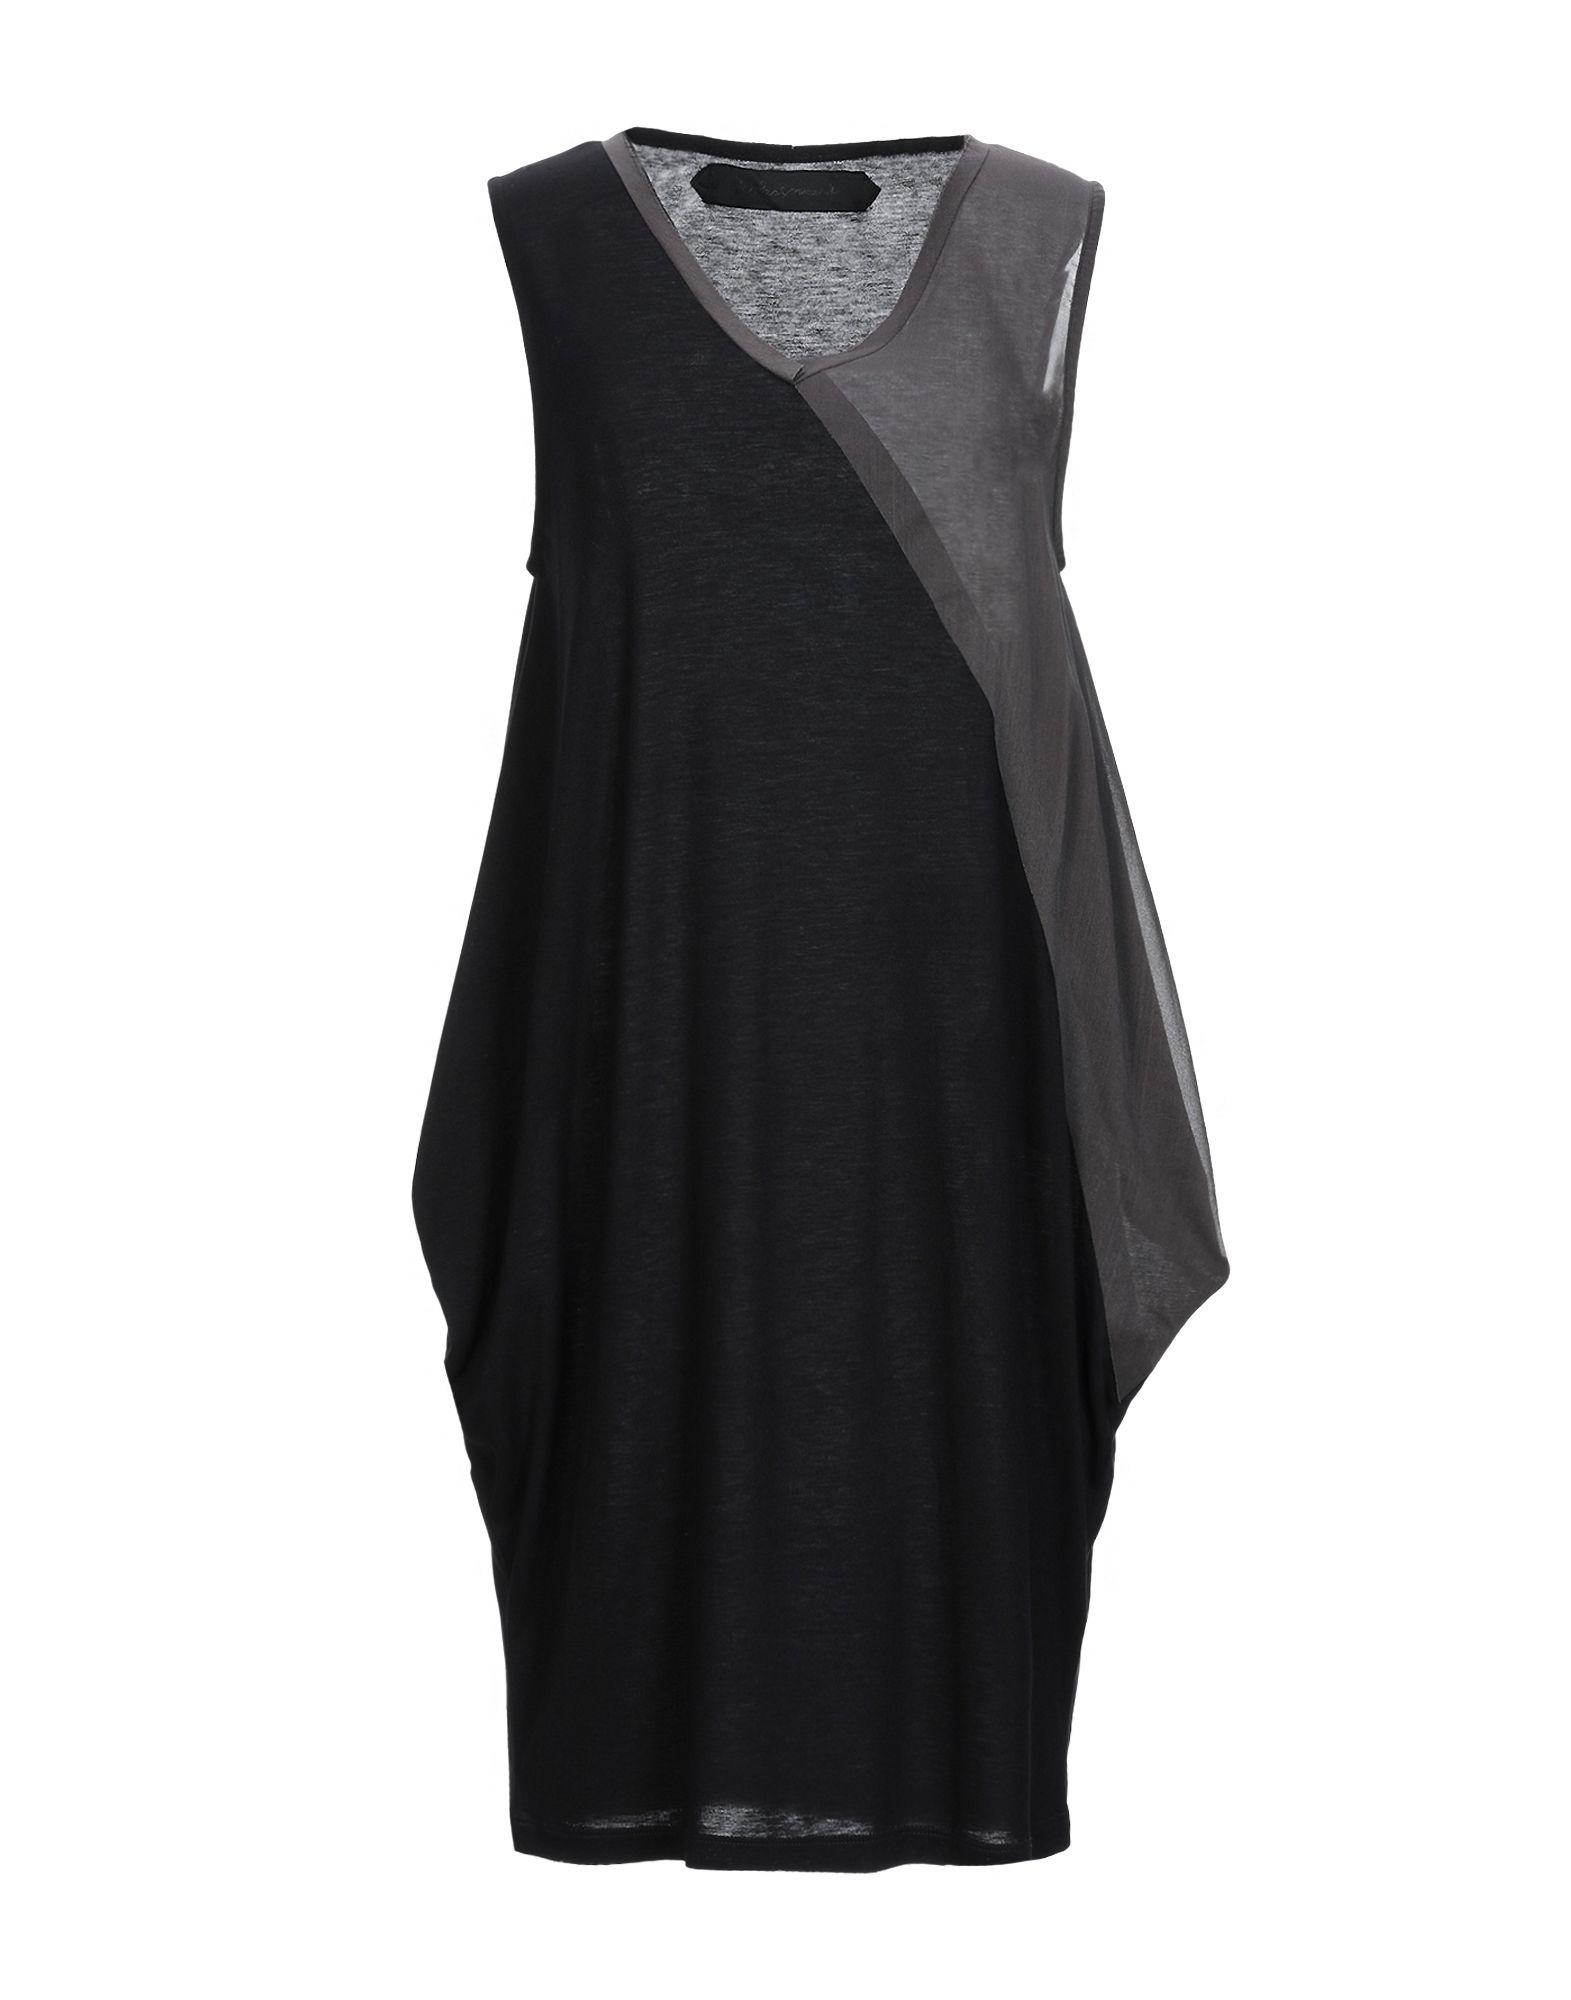 NICOLAS & MARK Короткое платье женское платье voguish mark impressure 1407a232383 2015